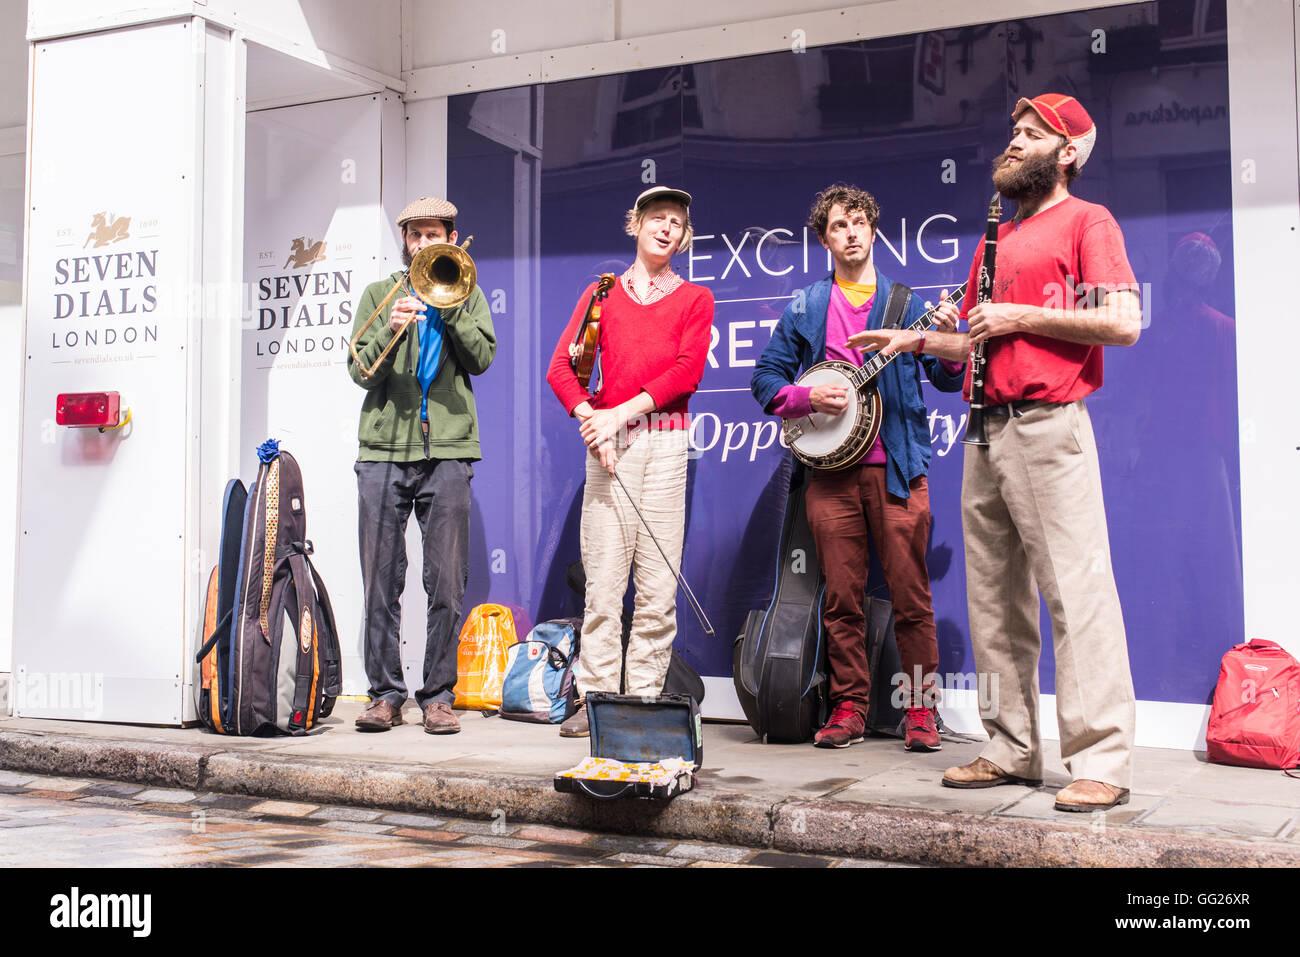 Quartet brass band busking during the Seven Dials street festival, London, UK - Stock Image